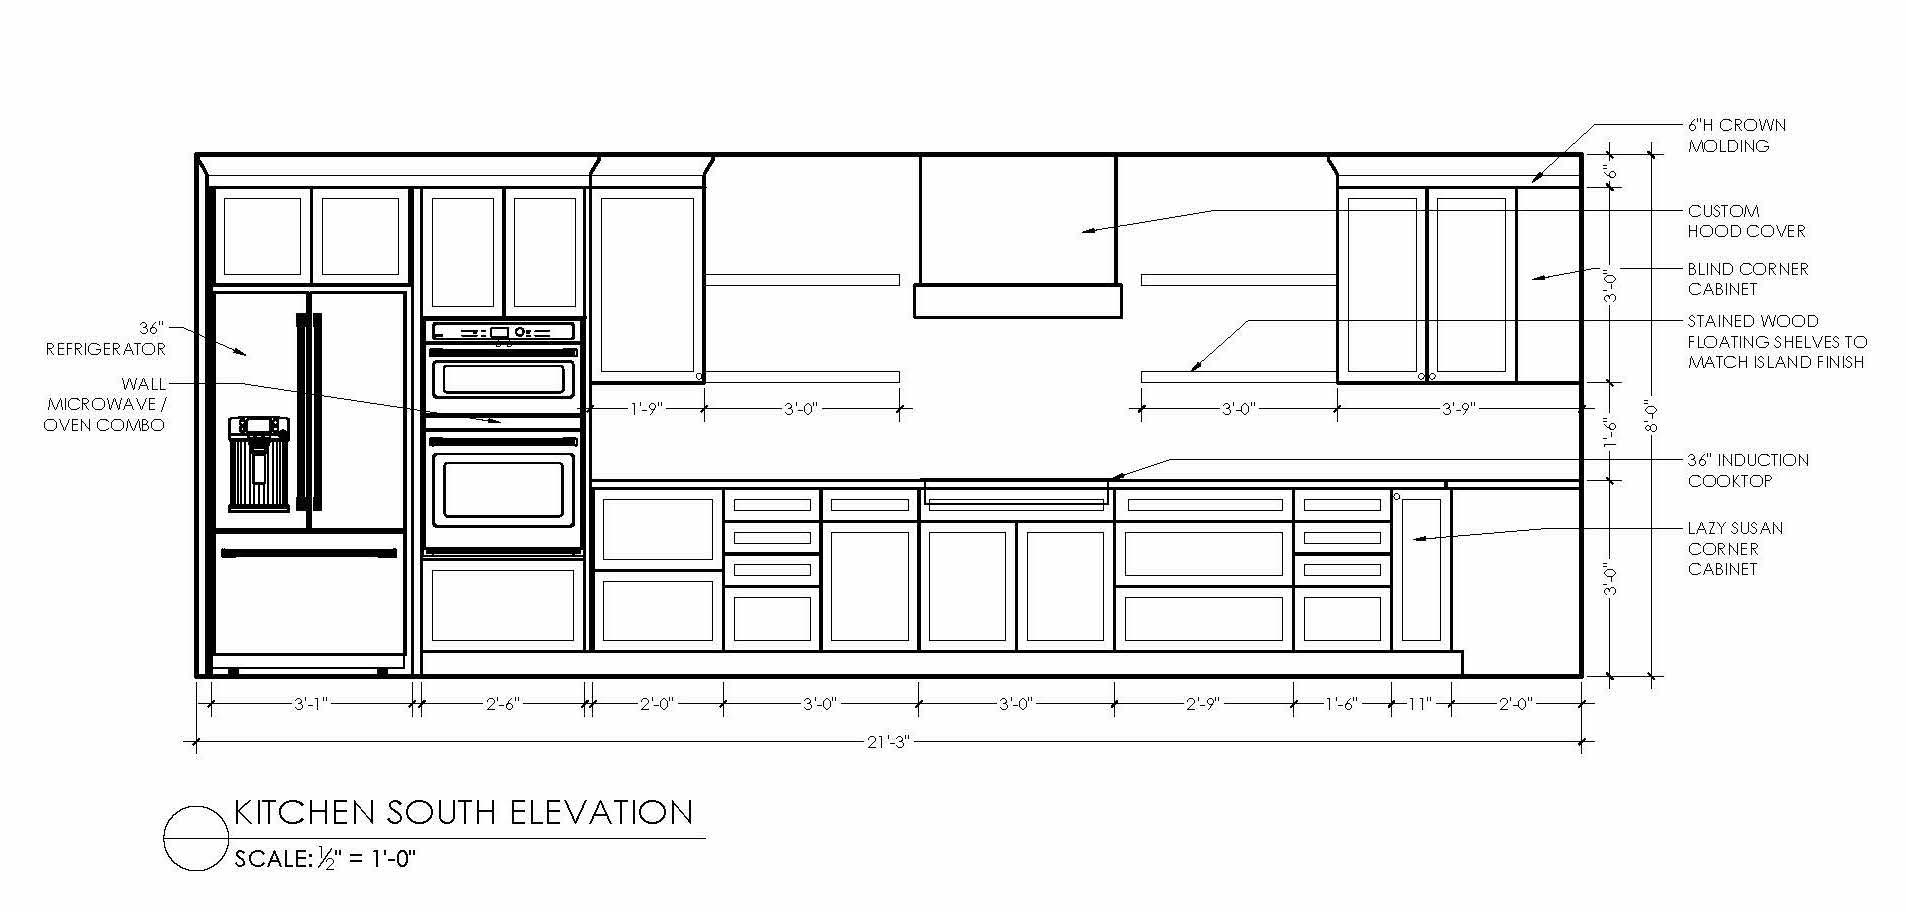 kitchen south elevation